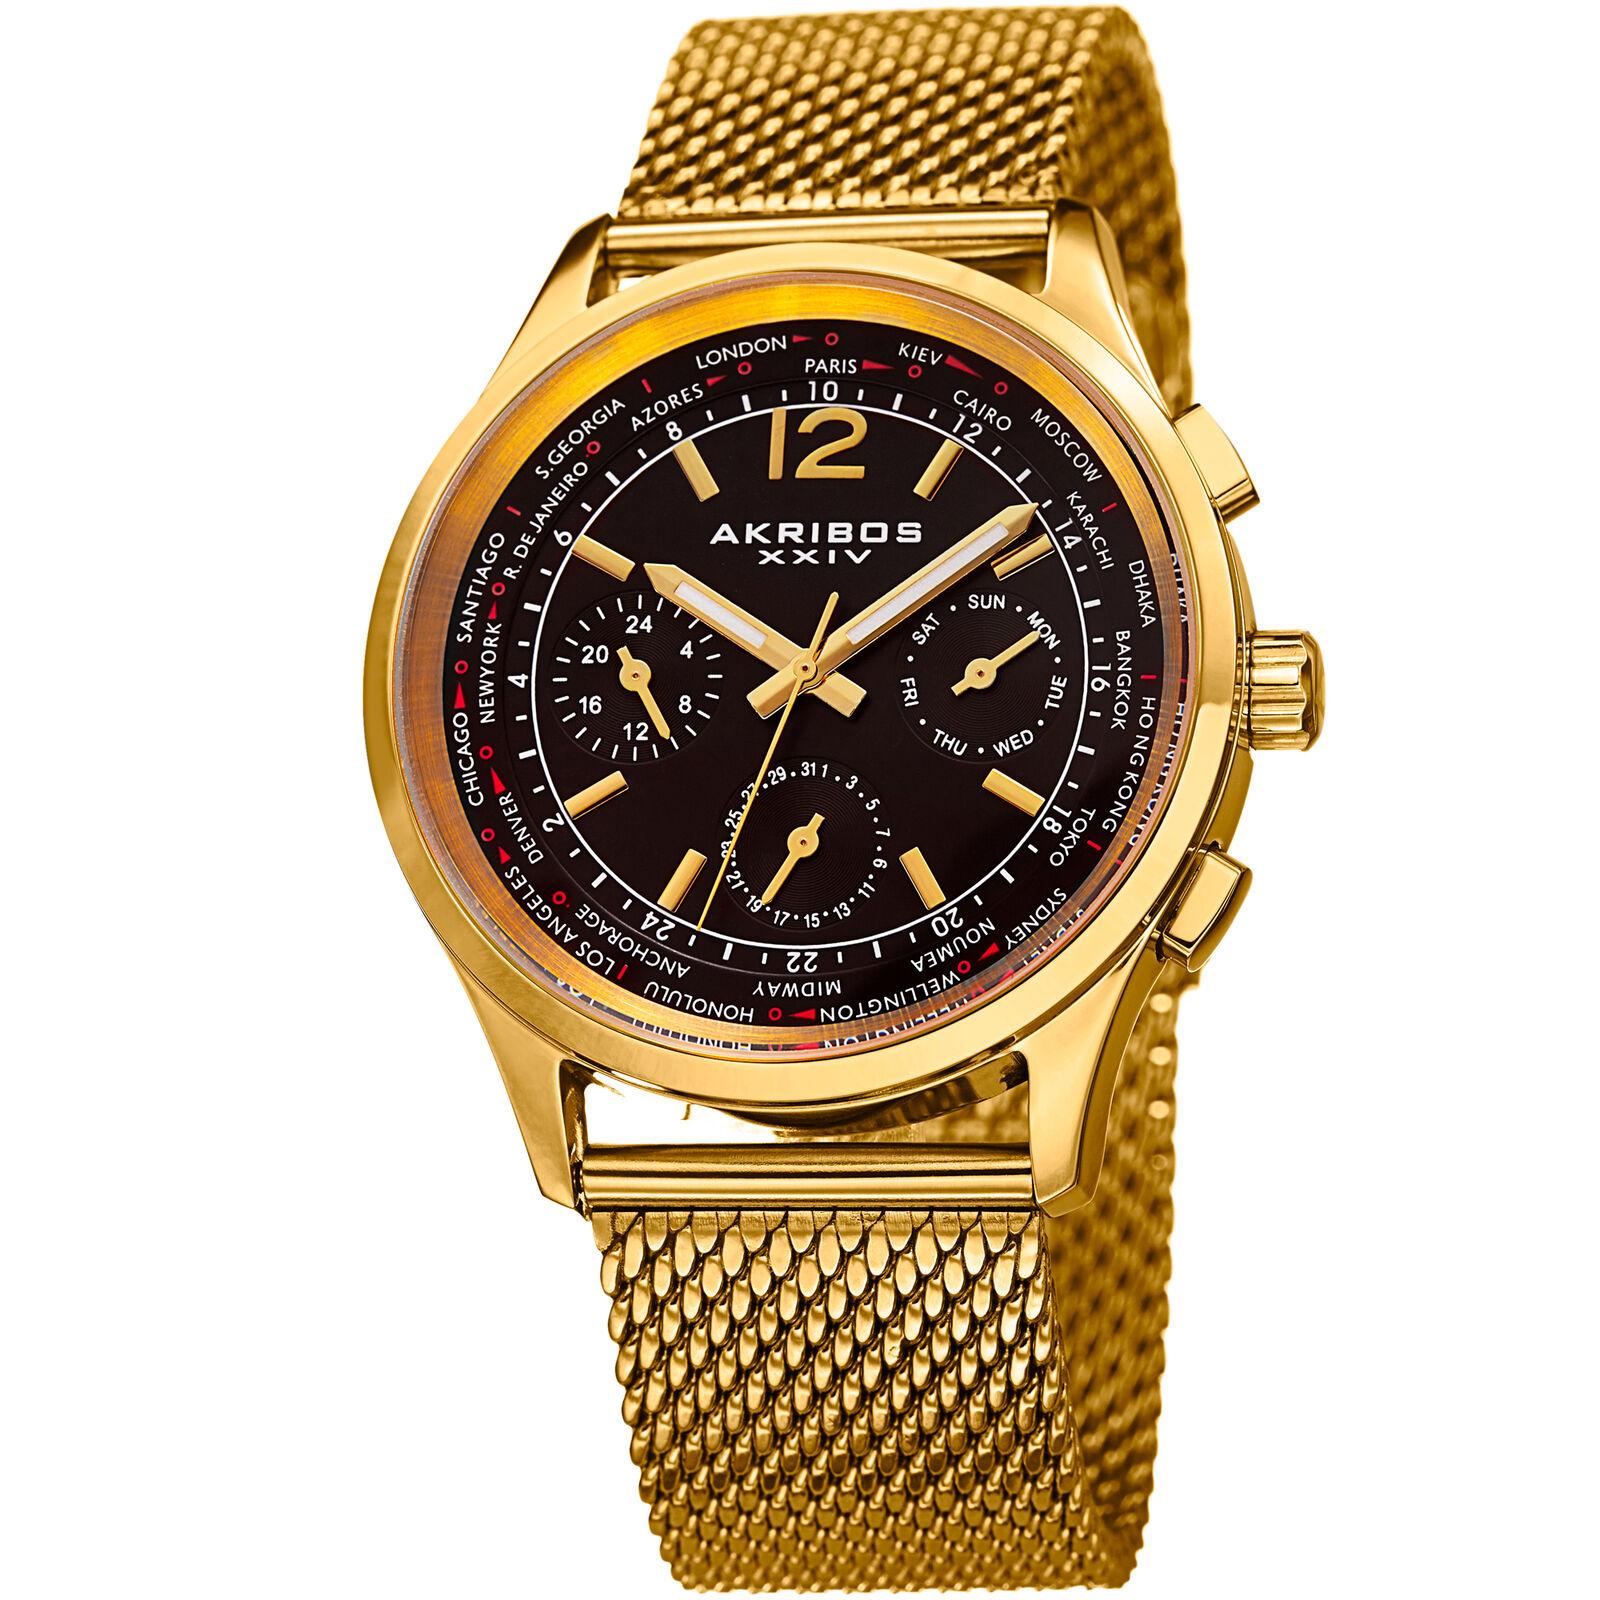 Mens Akribos XXIV AK716 Multifunction Day Date Stainless Steel Mesh Watch